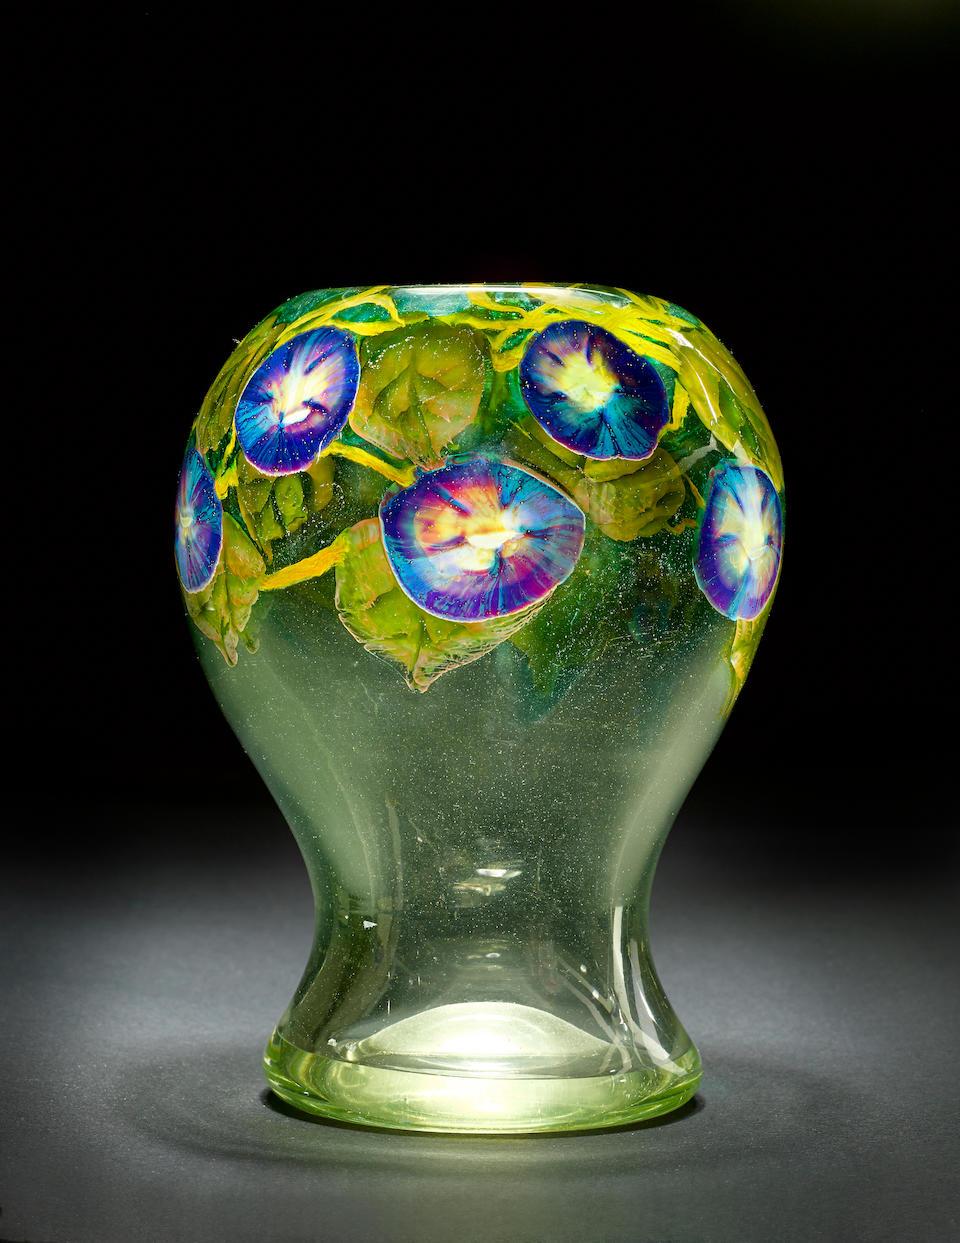 Tiffany Studios  An Important Morning Glory Paperweight Vase, circa 1915